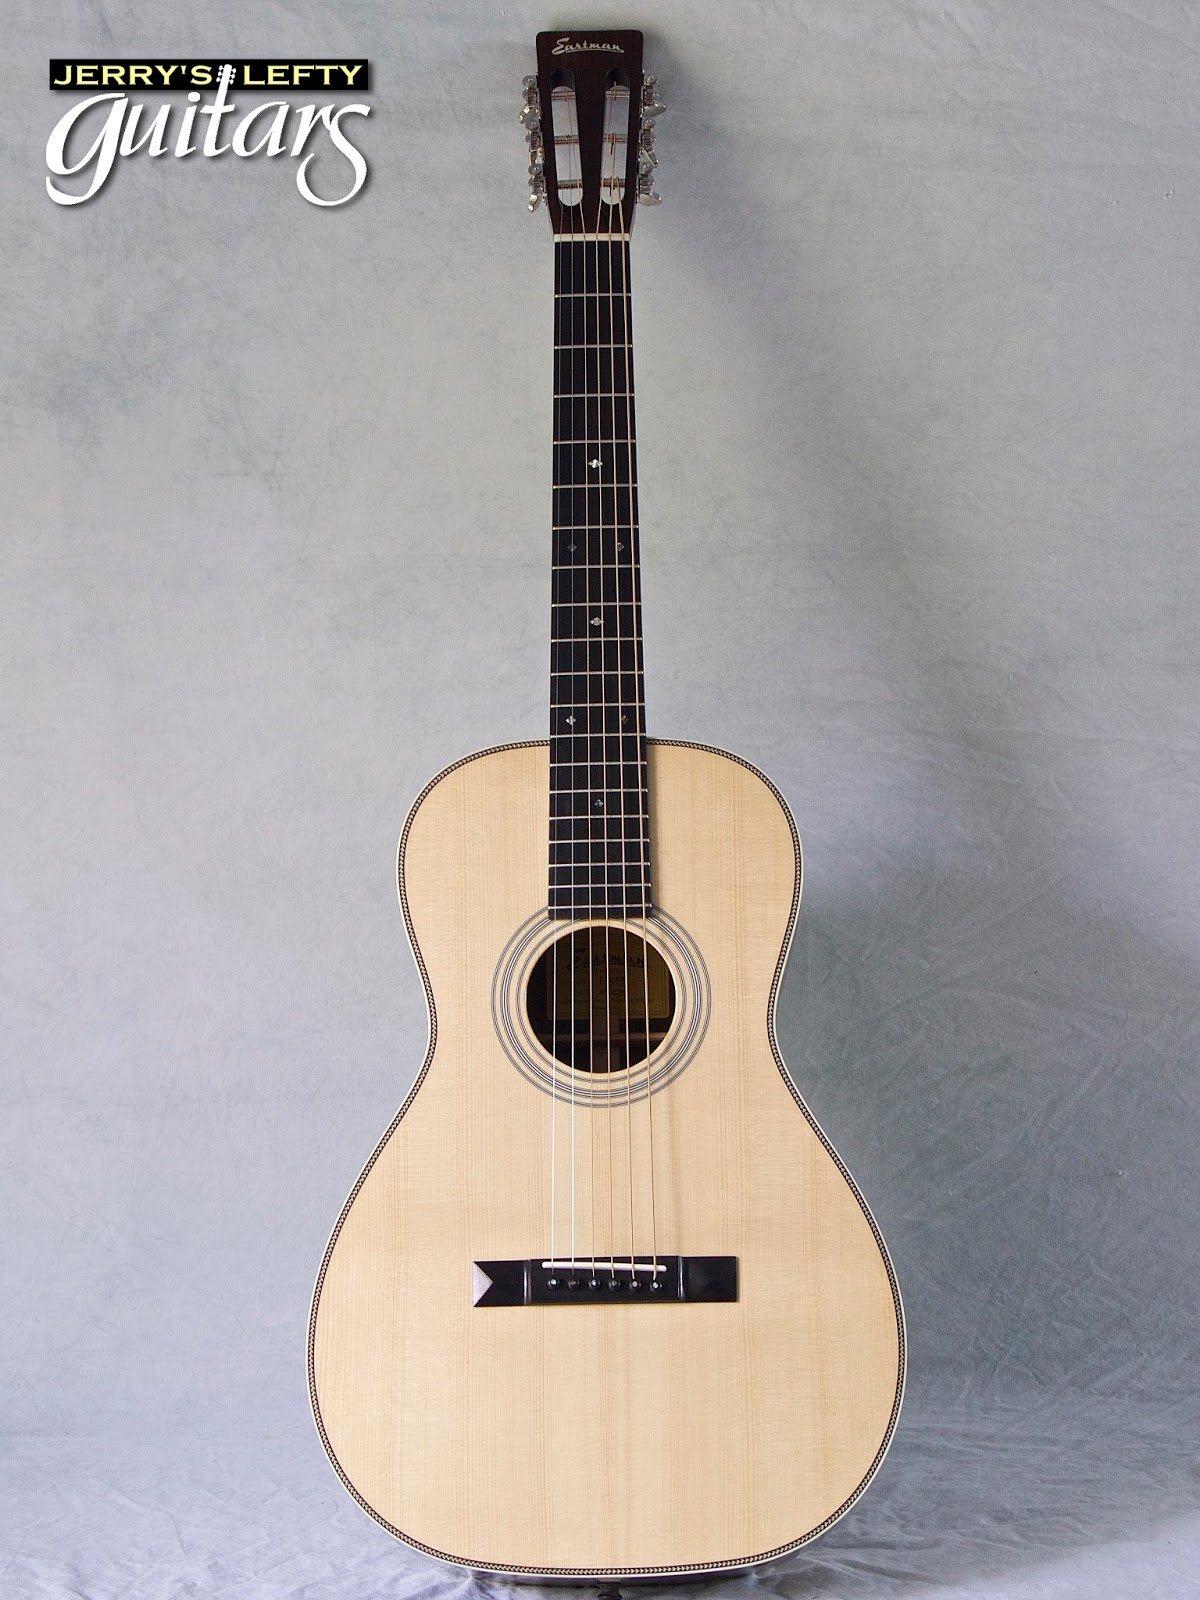 jerry 39 s lefty guitars newest guitar arrivals updated weekly eastman e20p parlor left handed. Black Bedroom Furniture Sets. Home Design Ideas